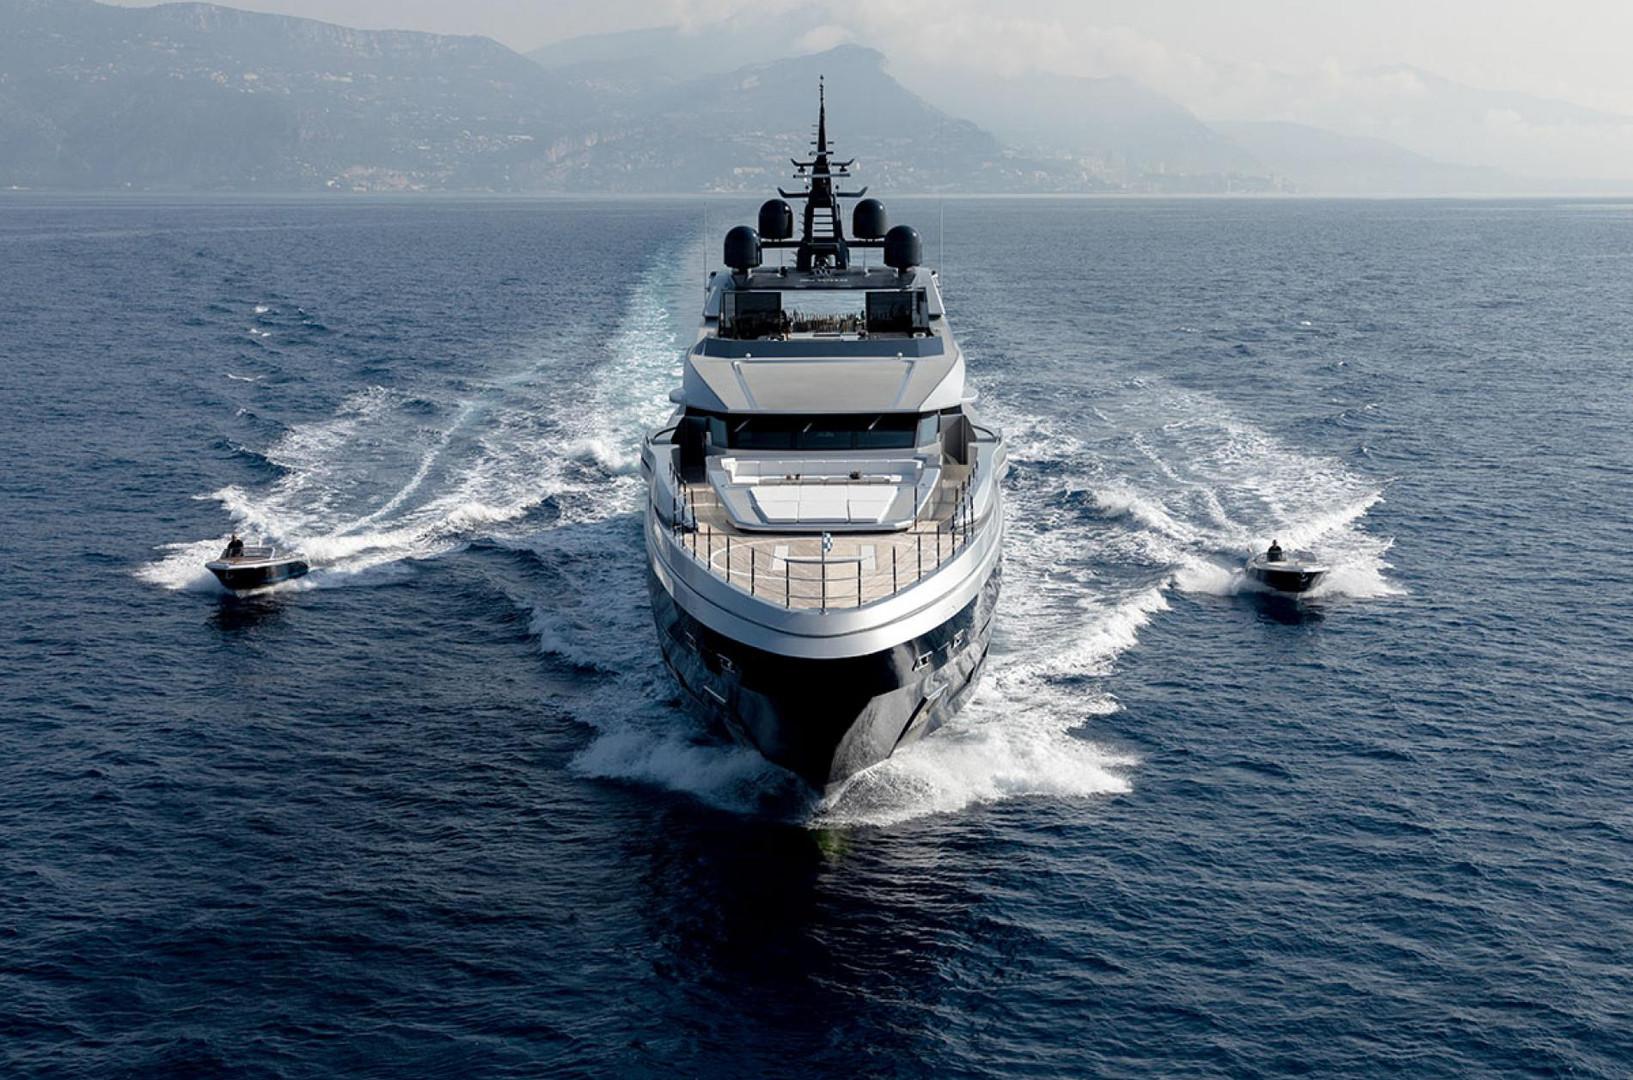 Yacht SARASTAR - the complete charter flotilla!!